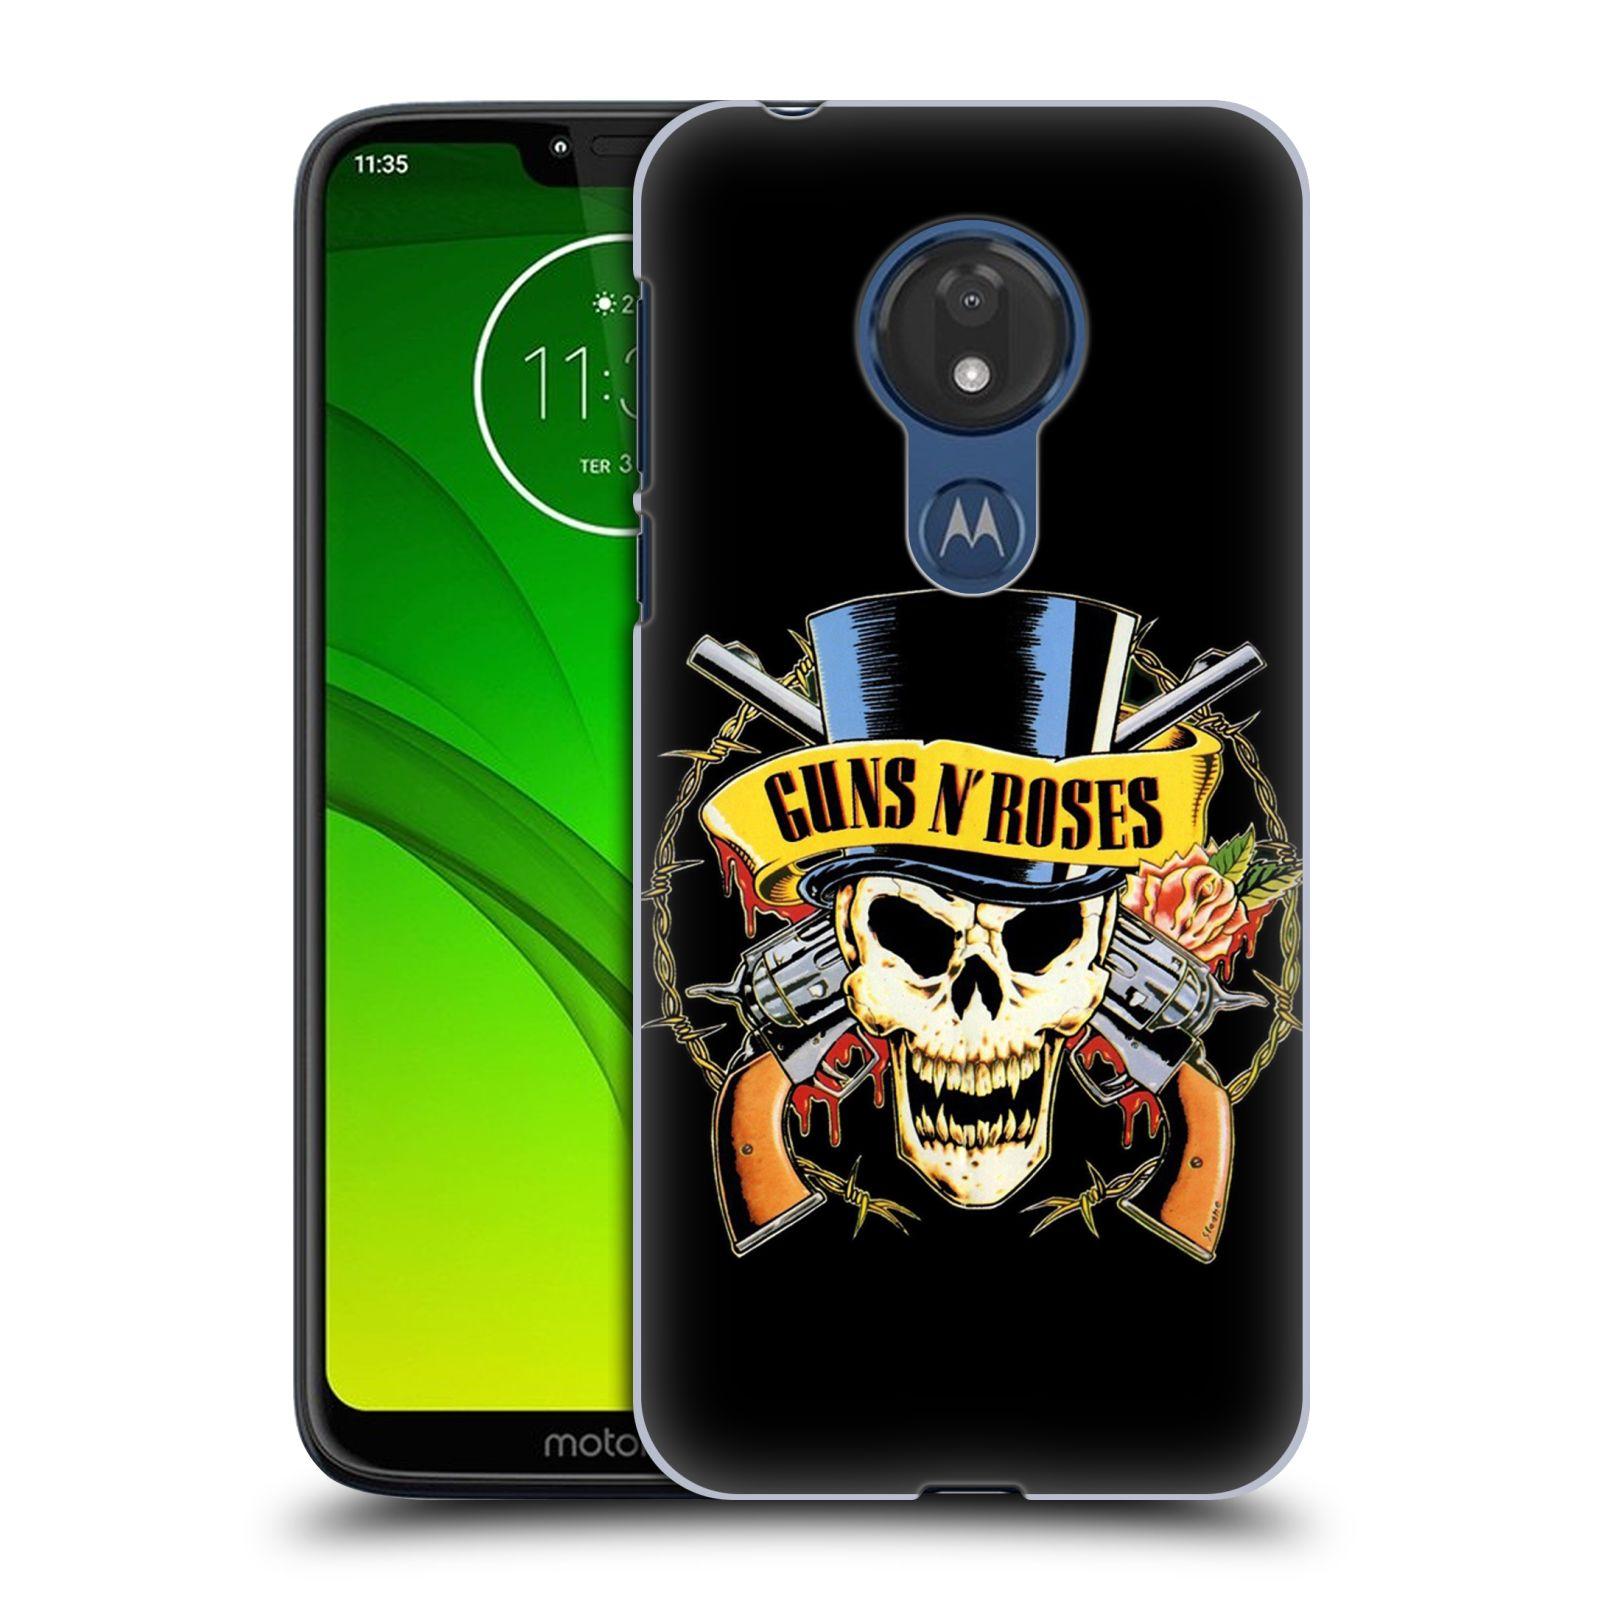 Plastové pouzdro na mobil Motorola Moto G7 Power - Head Case - Guns N' Roses - Lebka